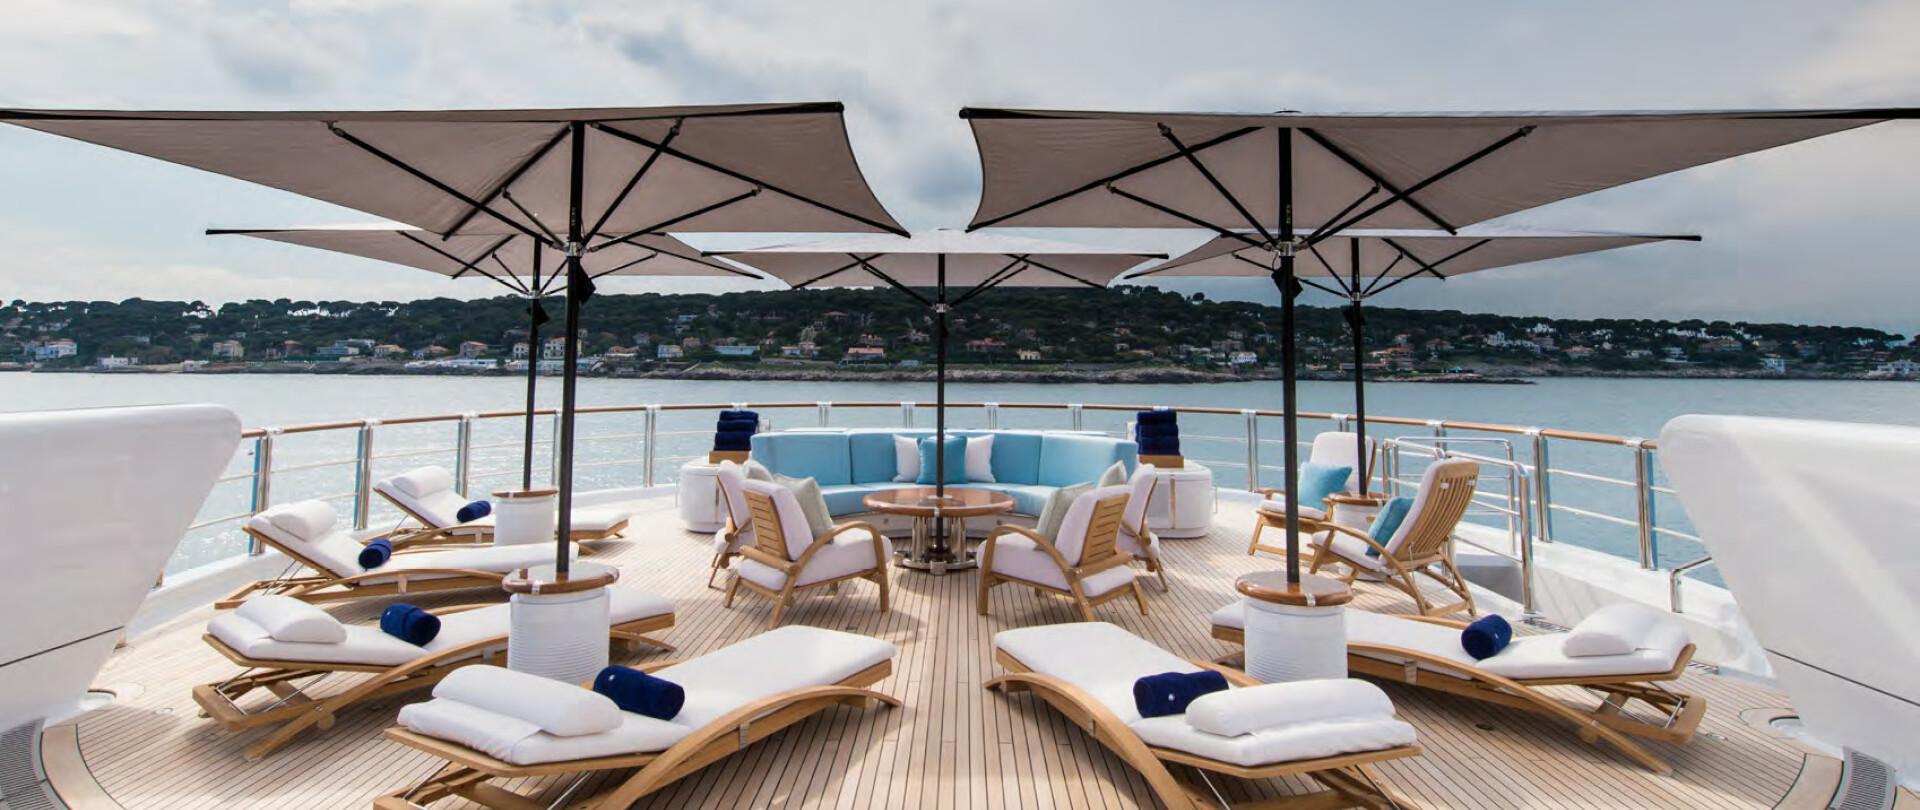 NIRVANA Yacht for Sale photo 4